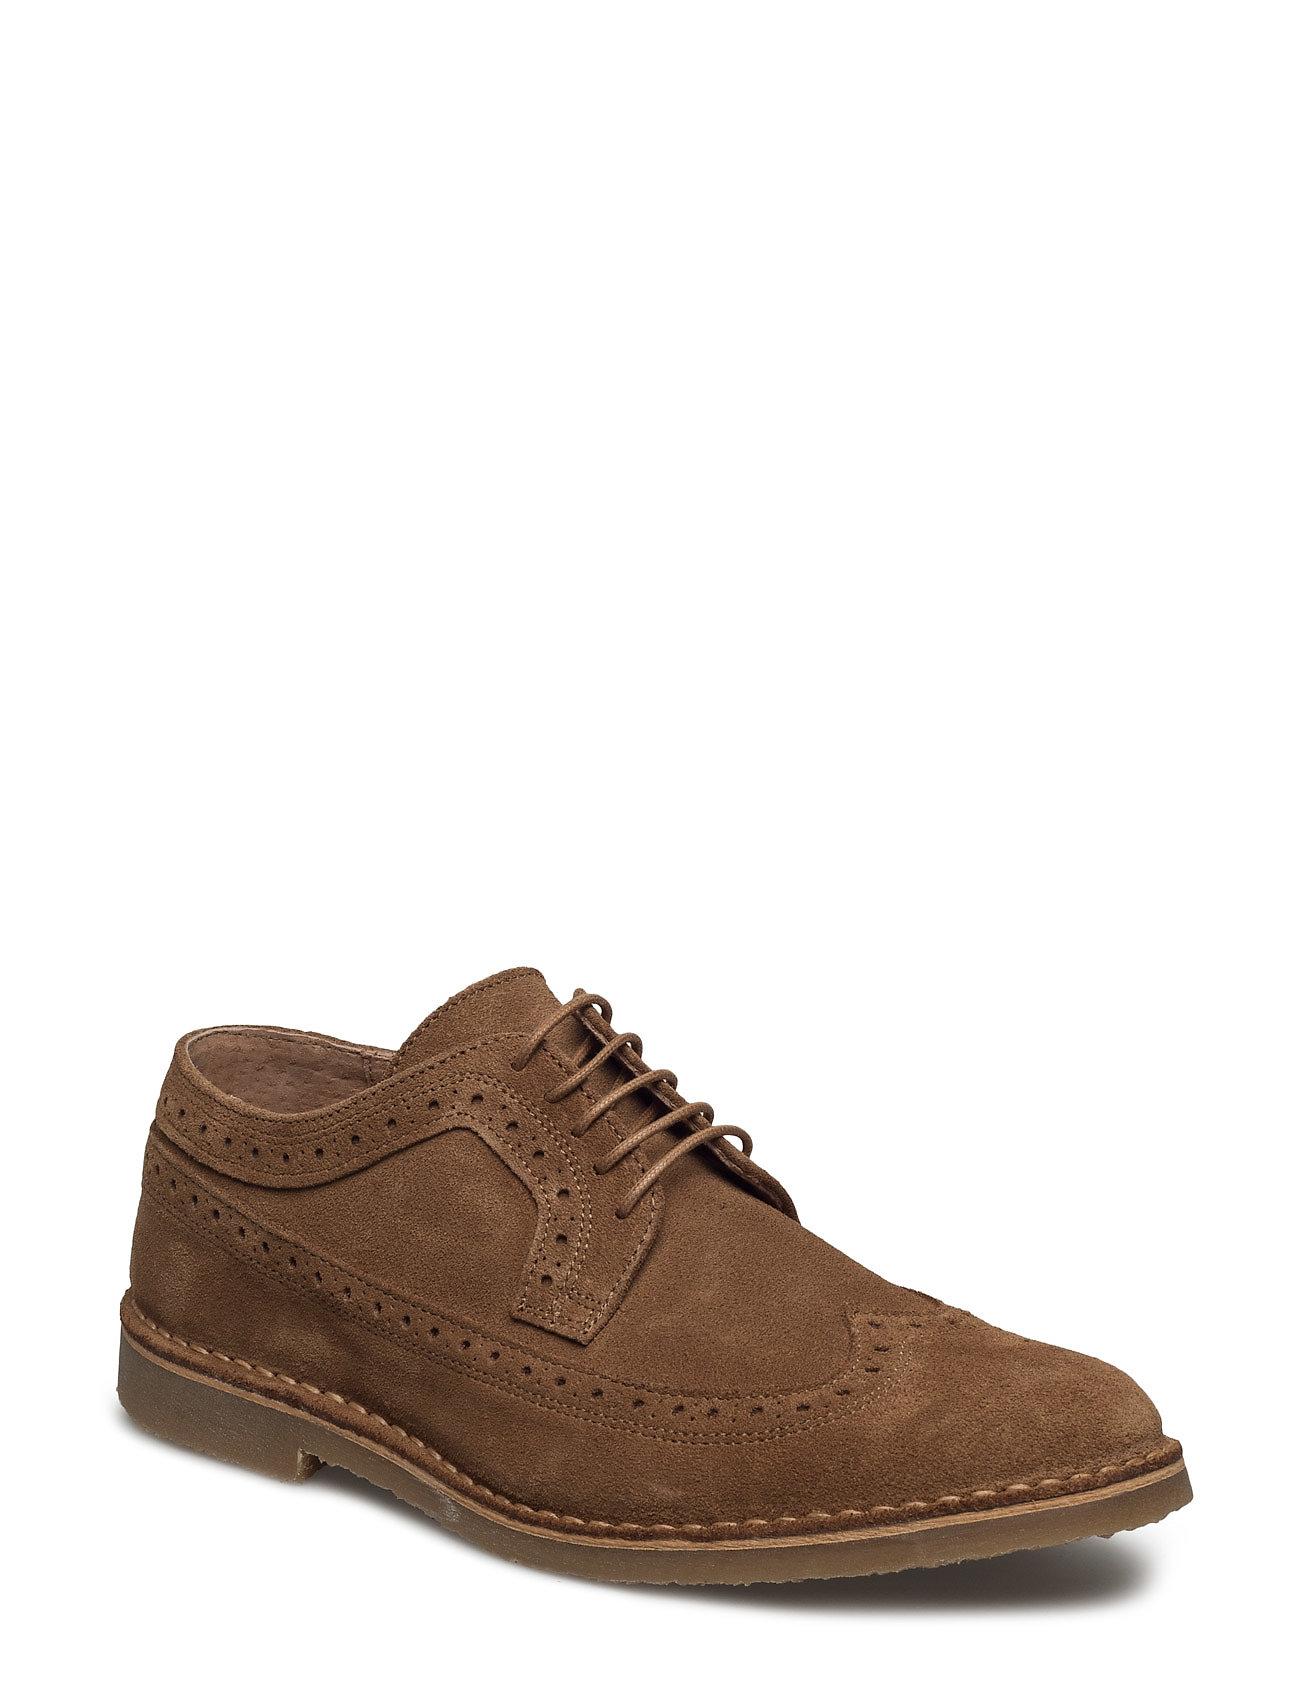 Shhroyce New Light Suede Brogue Shoe Selected Homme Casual sko til Herrer i cognac